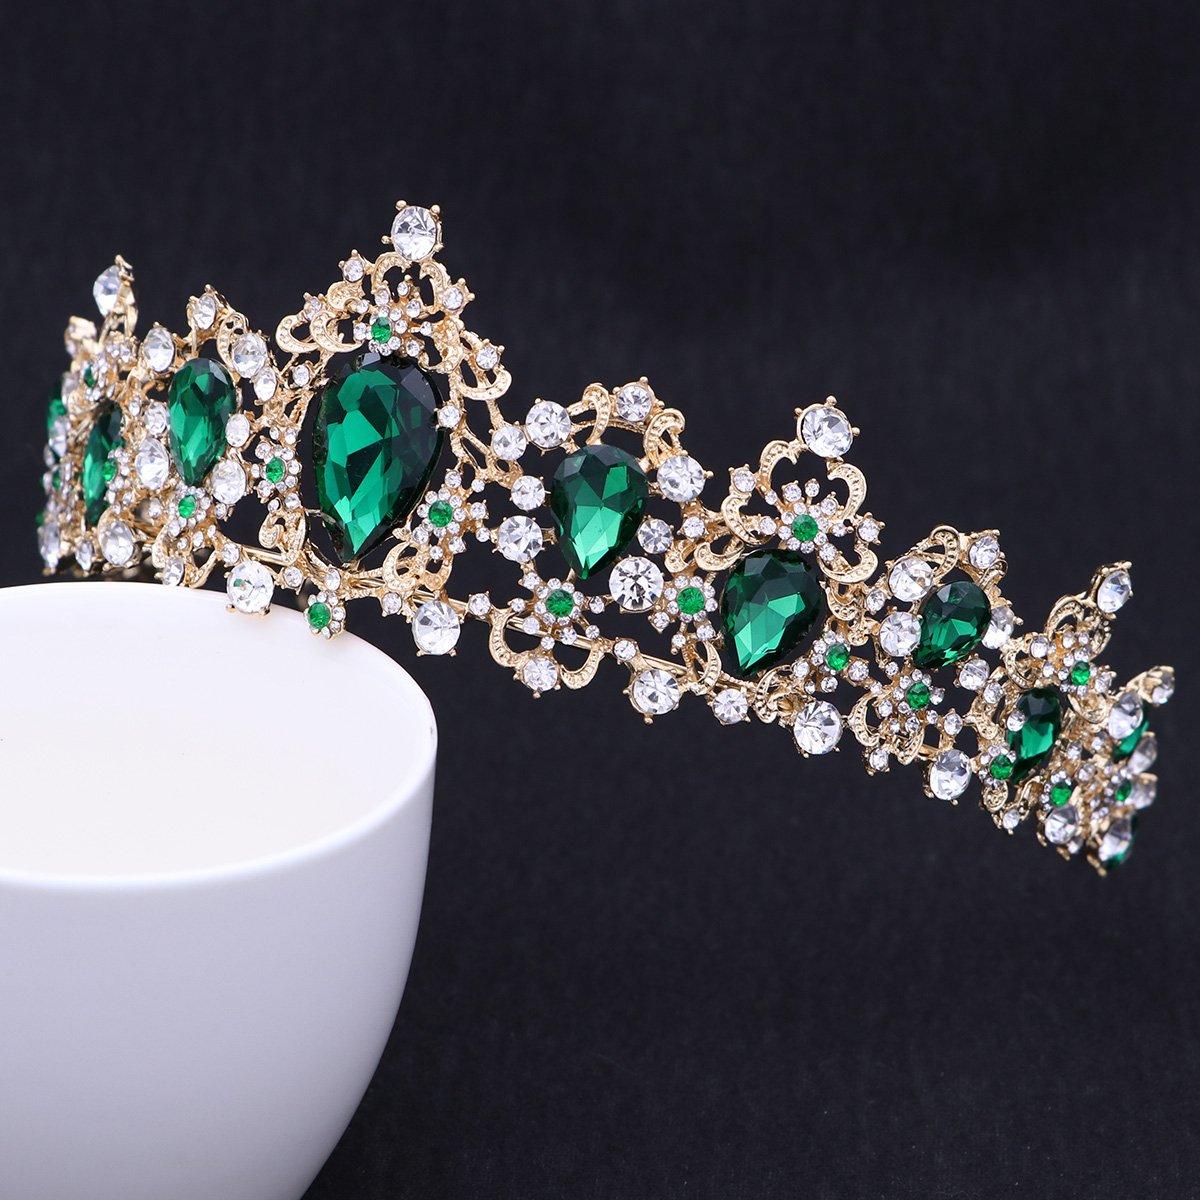 Royal Crystal Tiara Green Rhinestone Queen Tiara Wedding Crown Princess Hair Accessories for Women (Emerald Color)